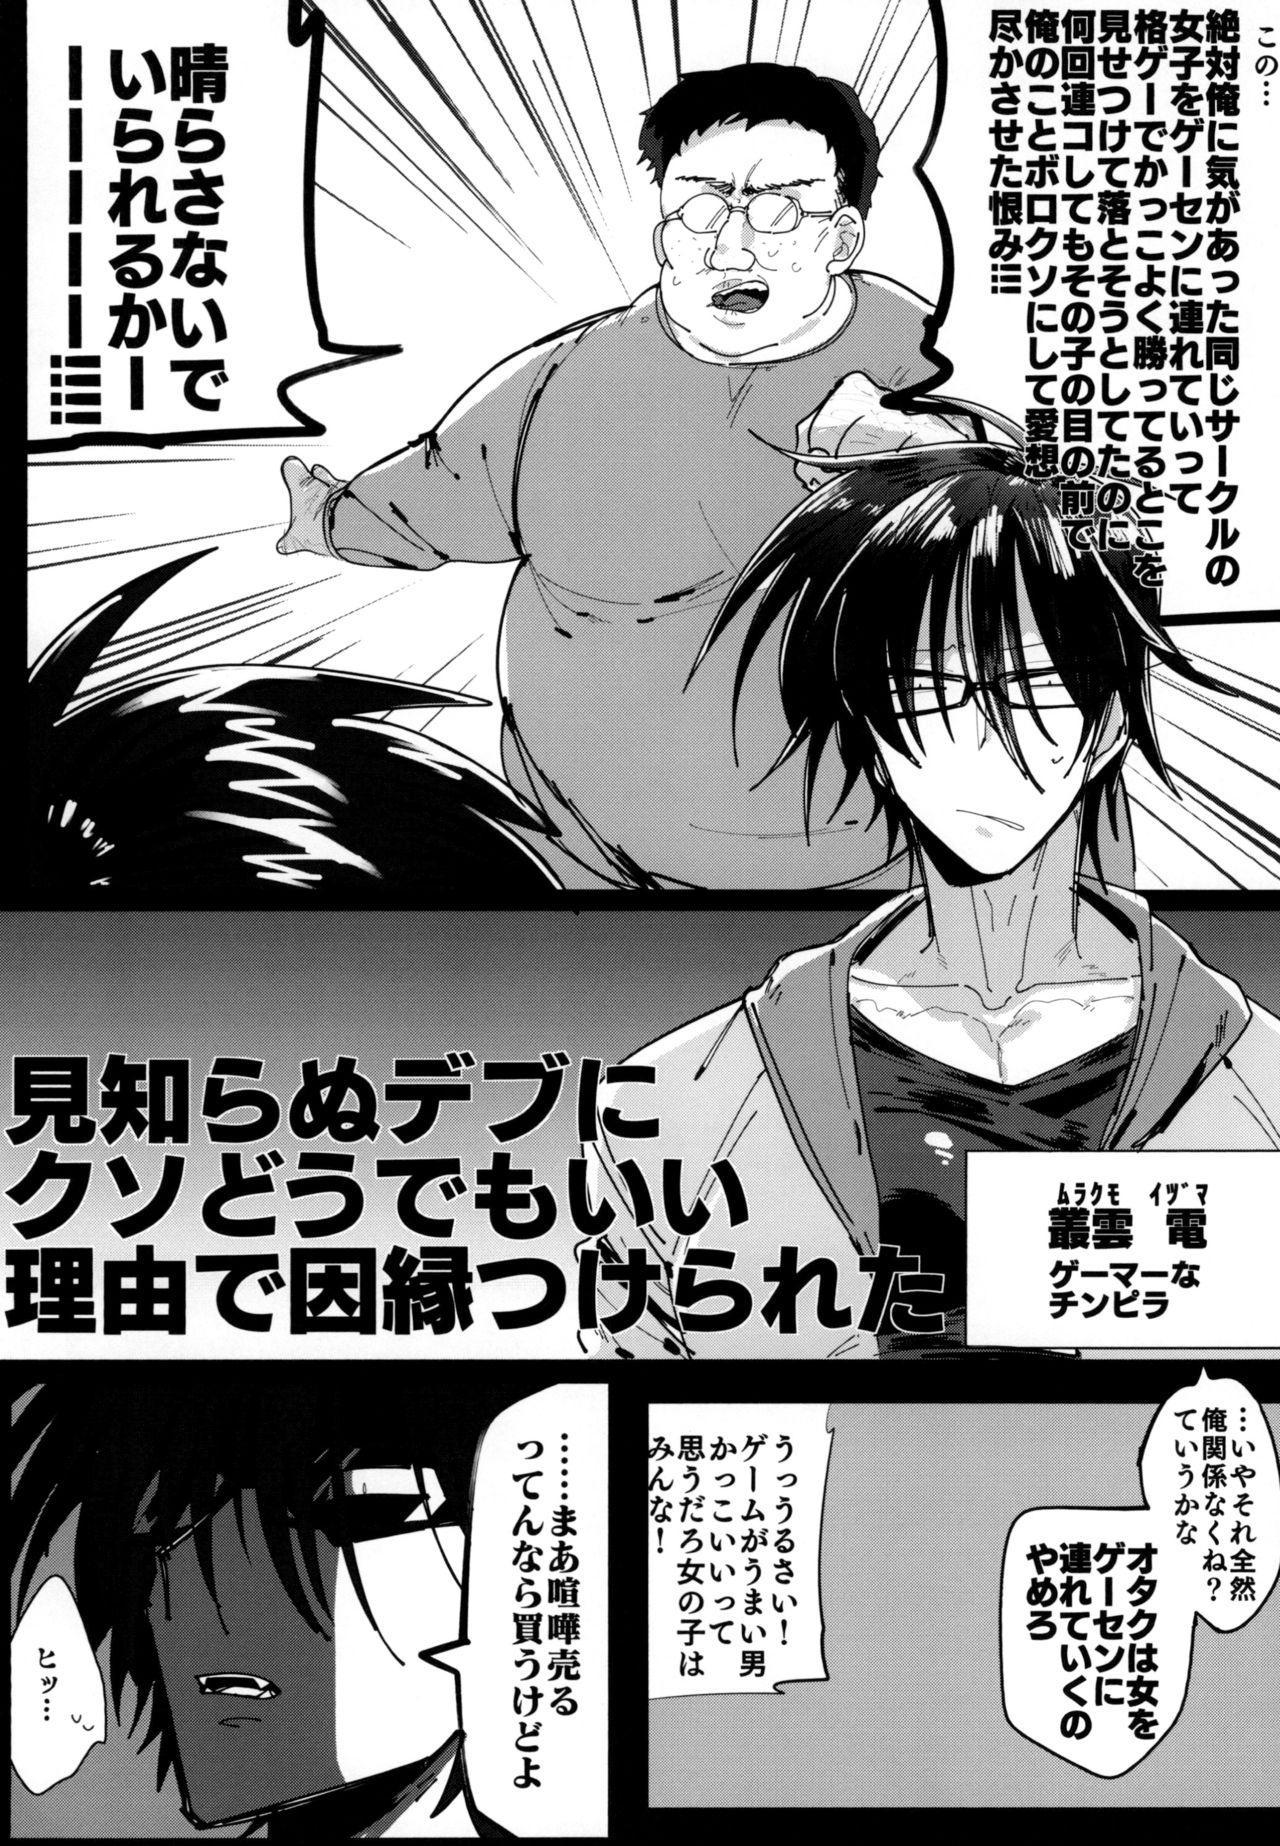 Kurokami Sanpakugan Megane Danshi TS Kyousei Fukujuu Fuck 3